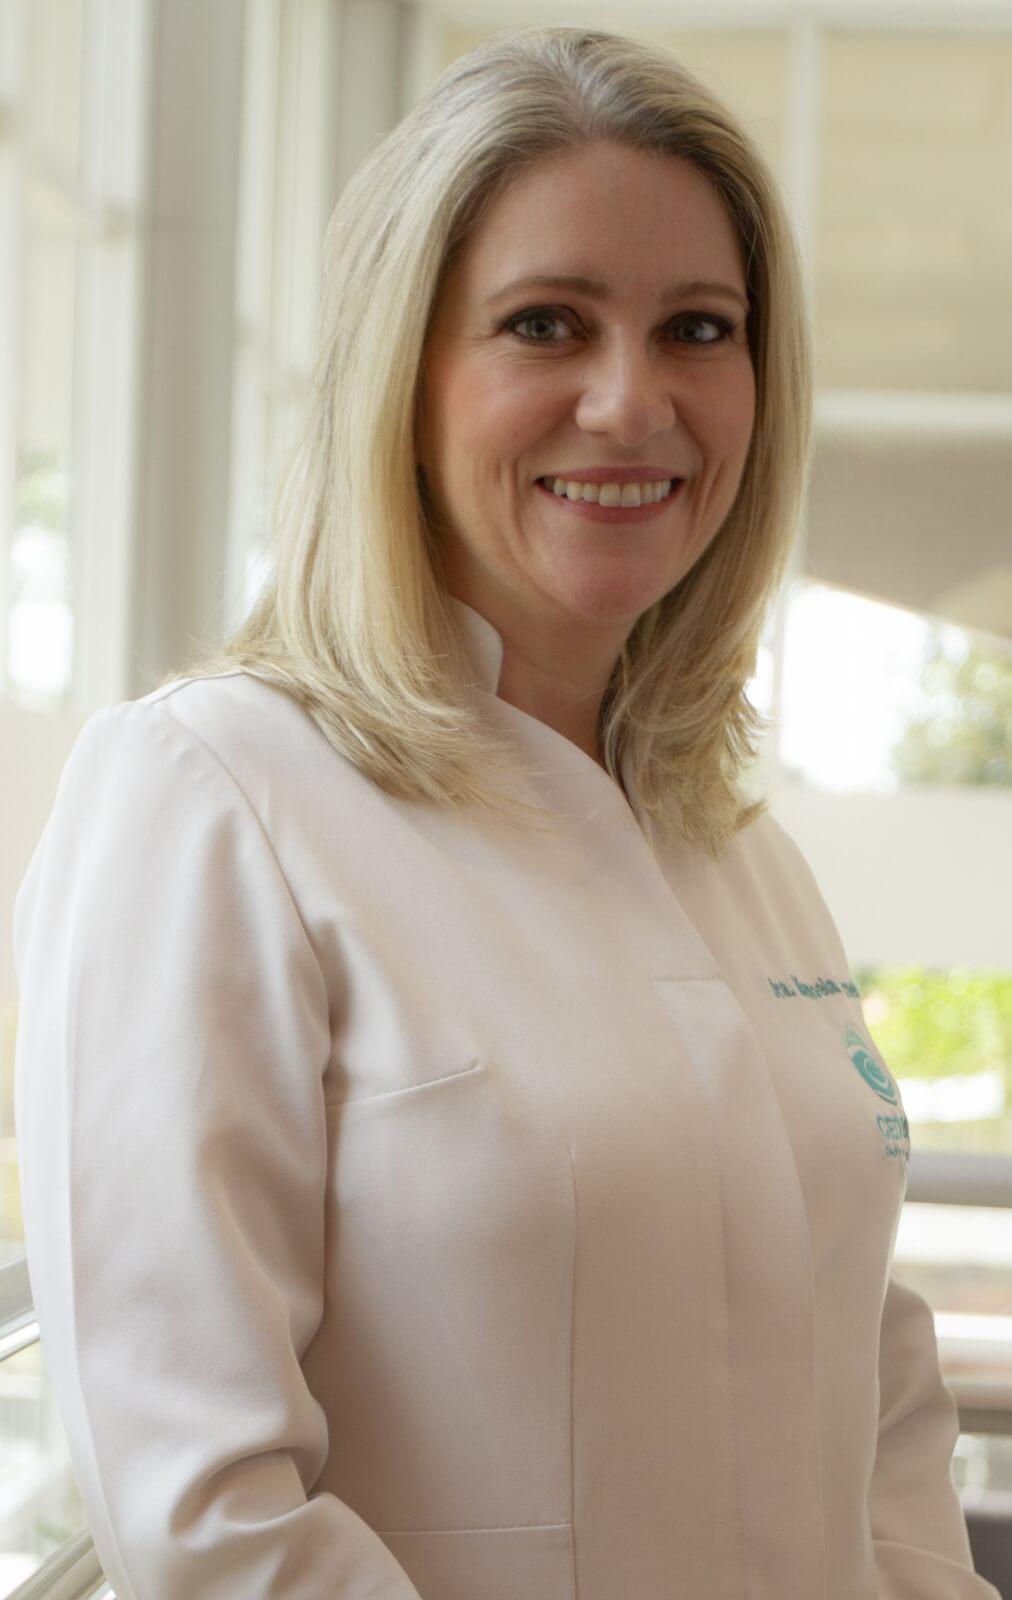 Dra. Manoela Carneiro